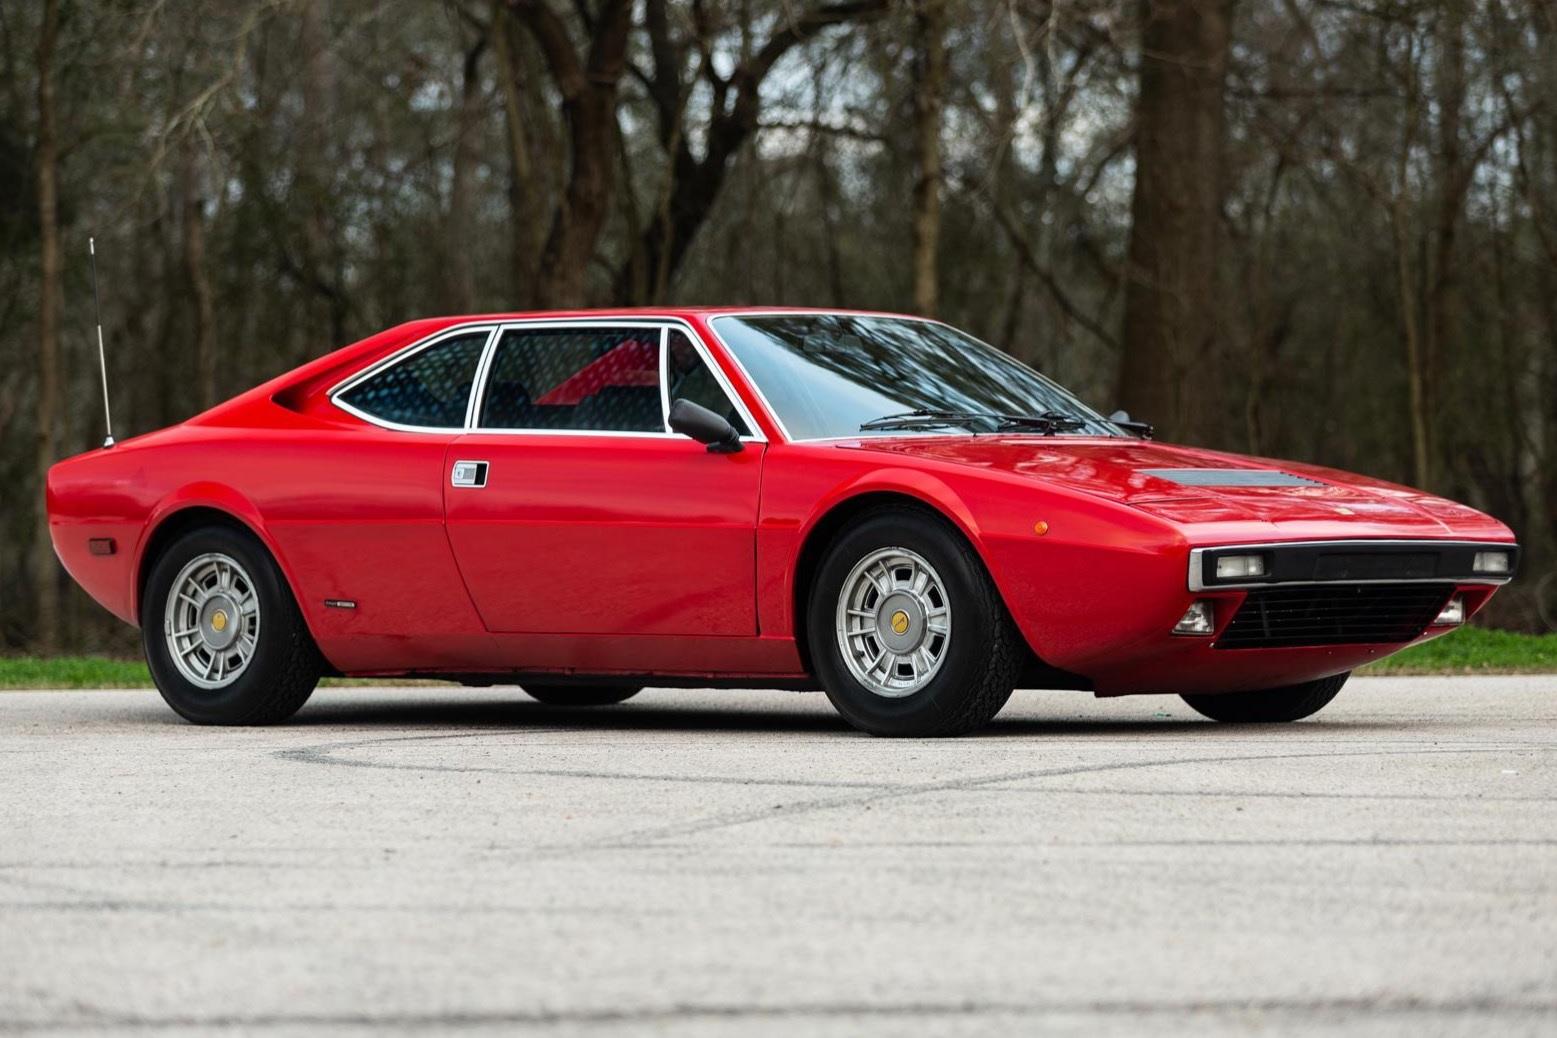 The 308 Gt4 Is The Best Kept Cheap Secret Of Classic Ferraris